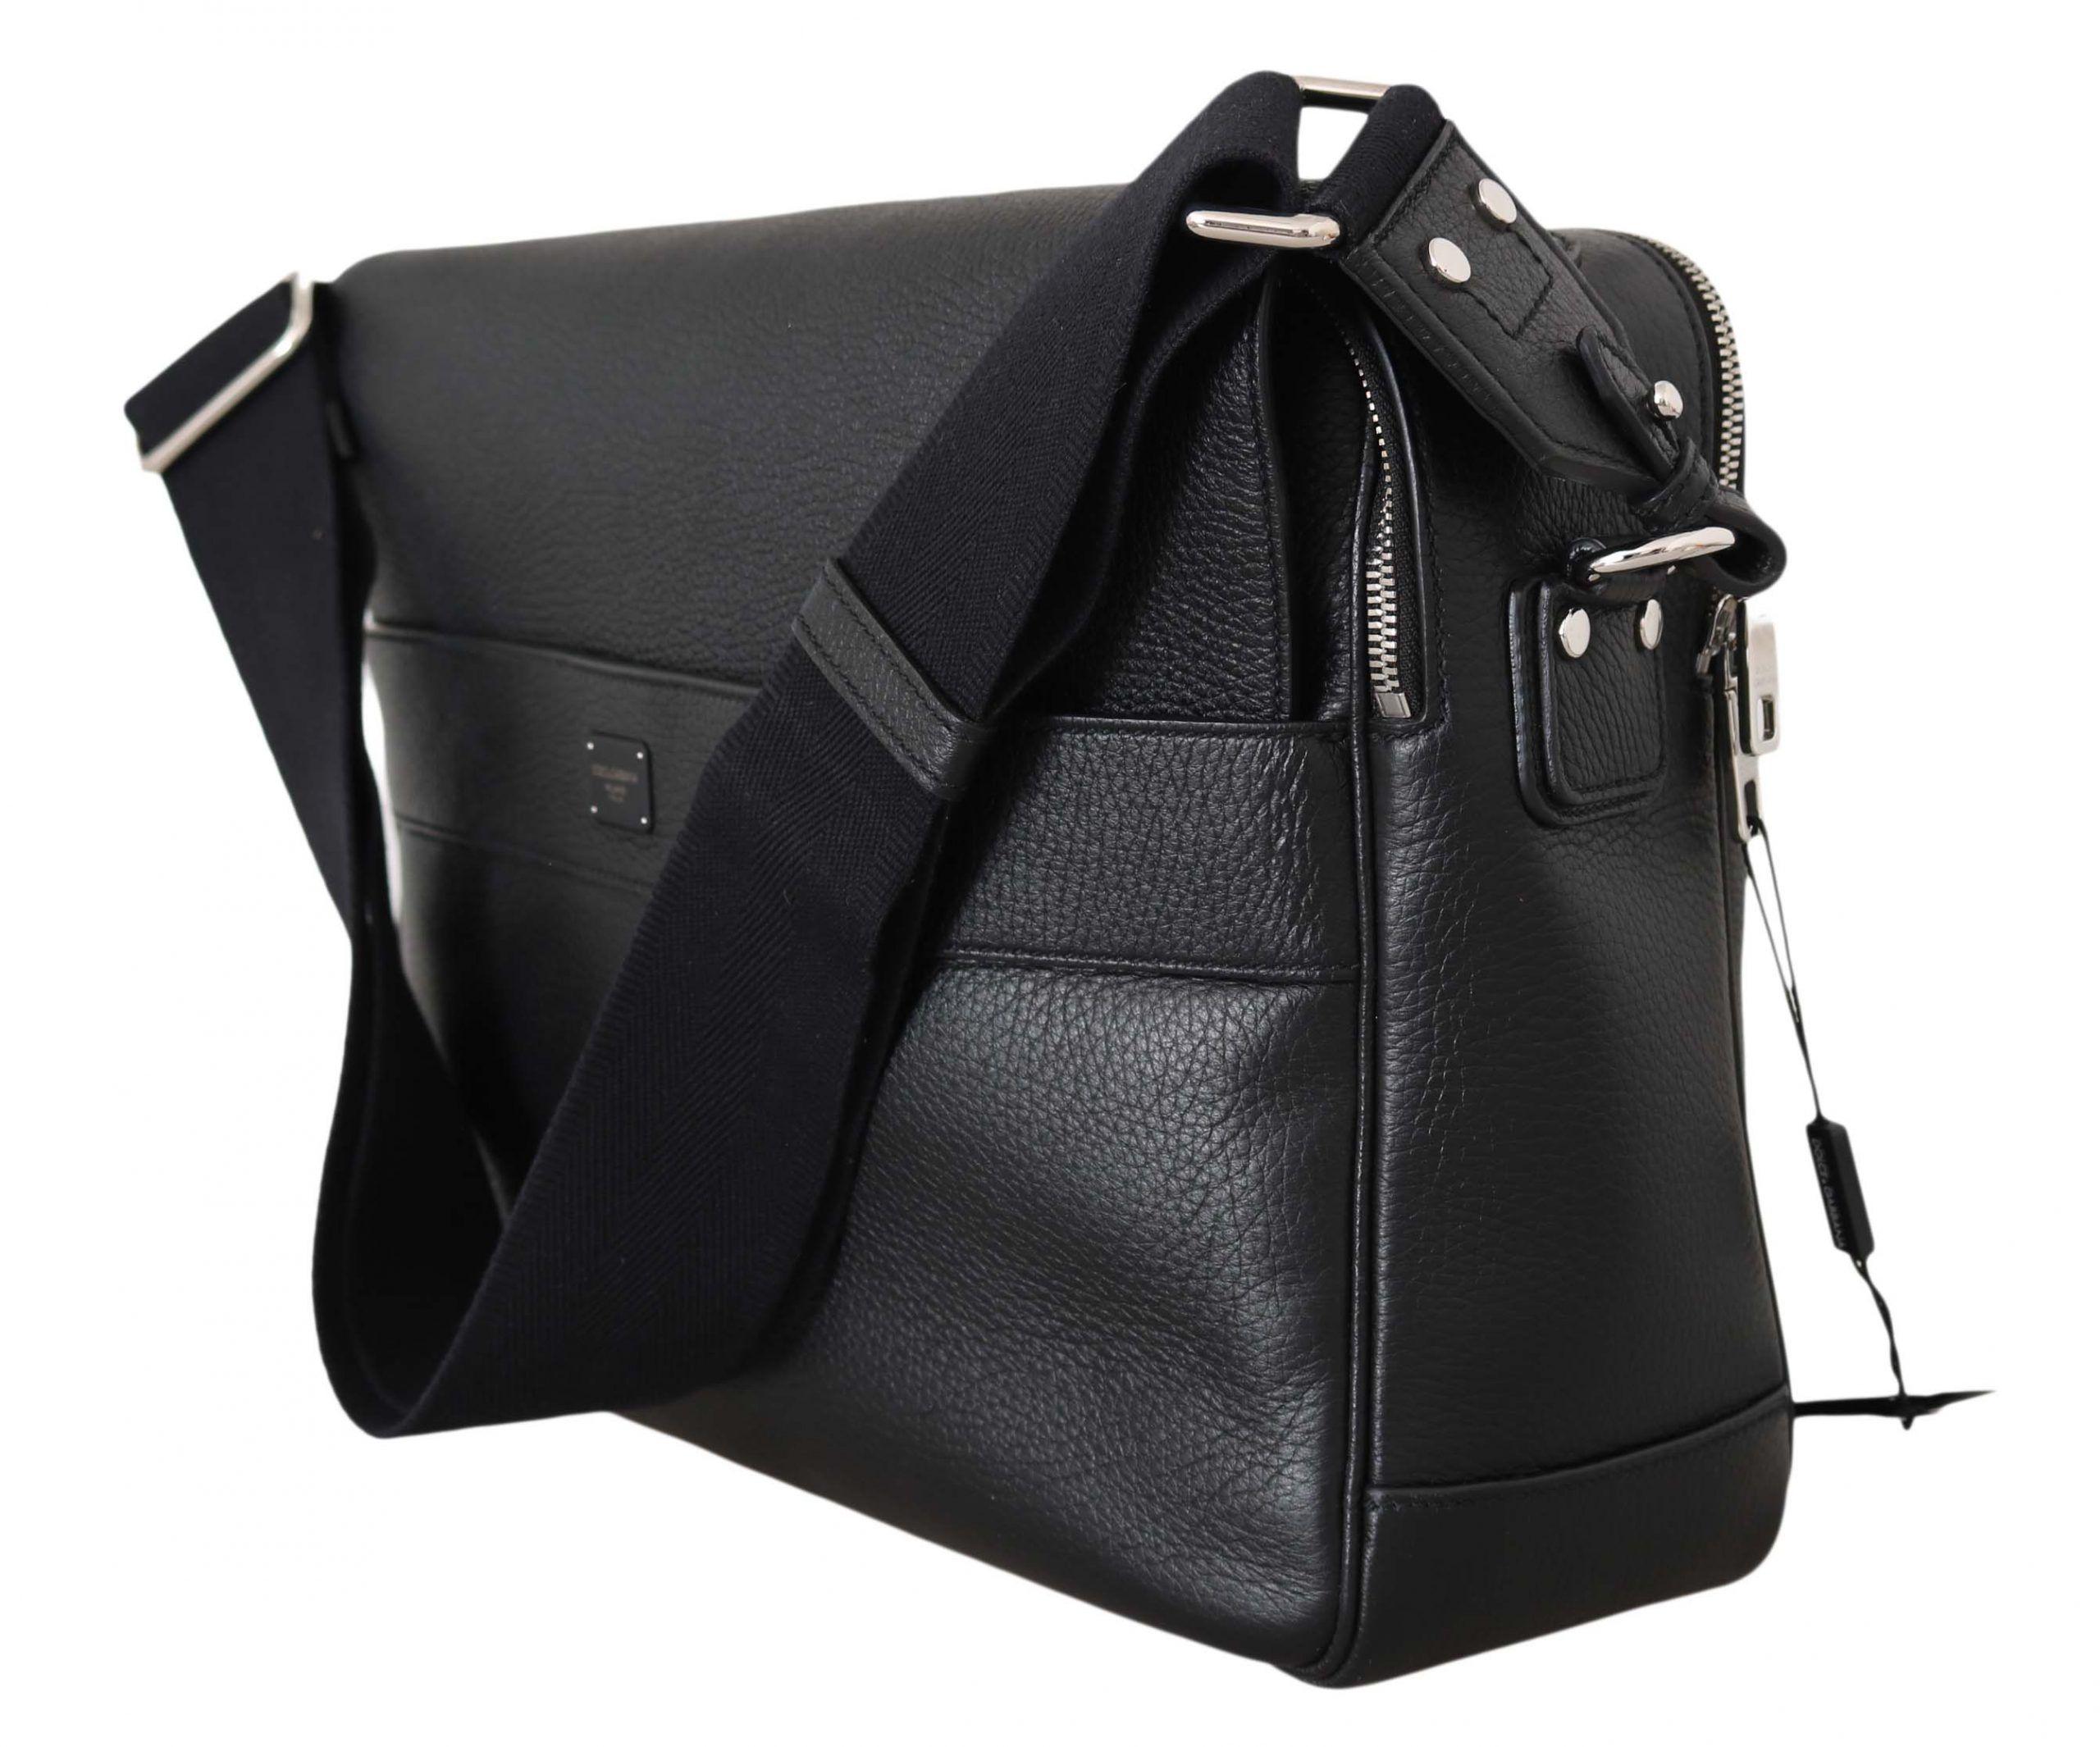 Dolce & Gabbana Black Leather Cross Body Messenger Travel School Bag